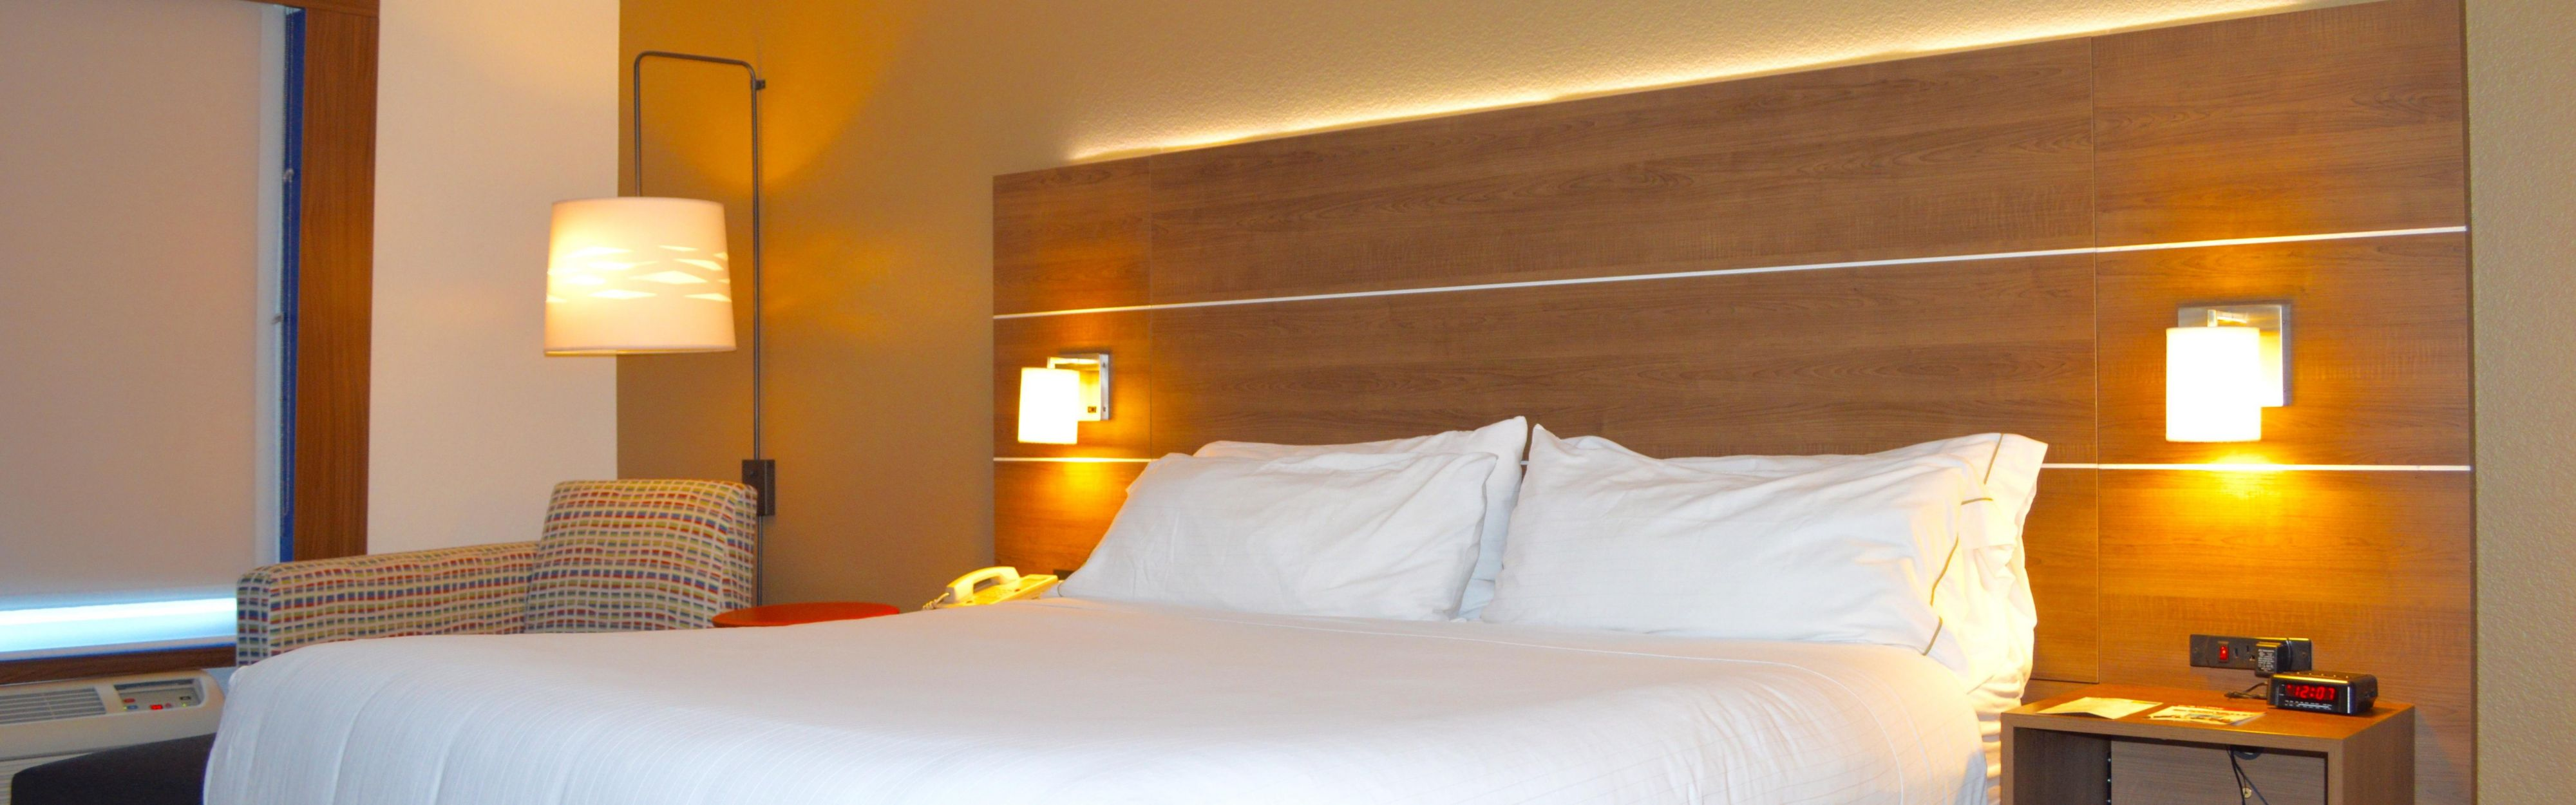 Holiday Inn Express Calexico image 1